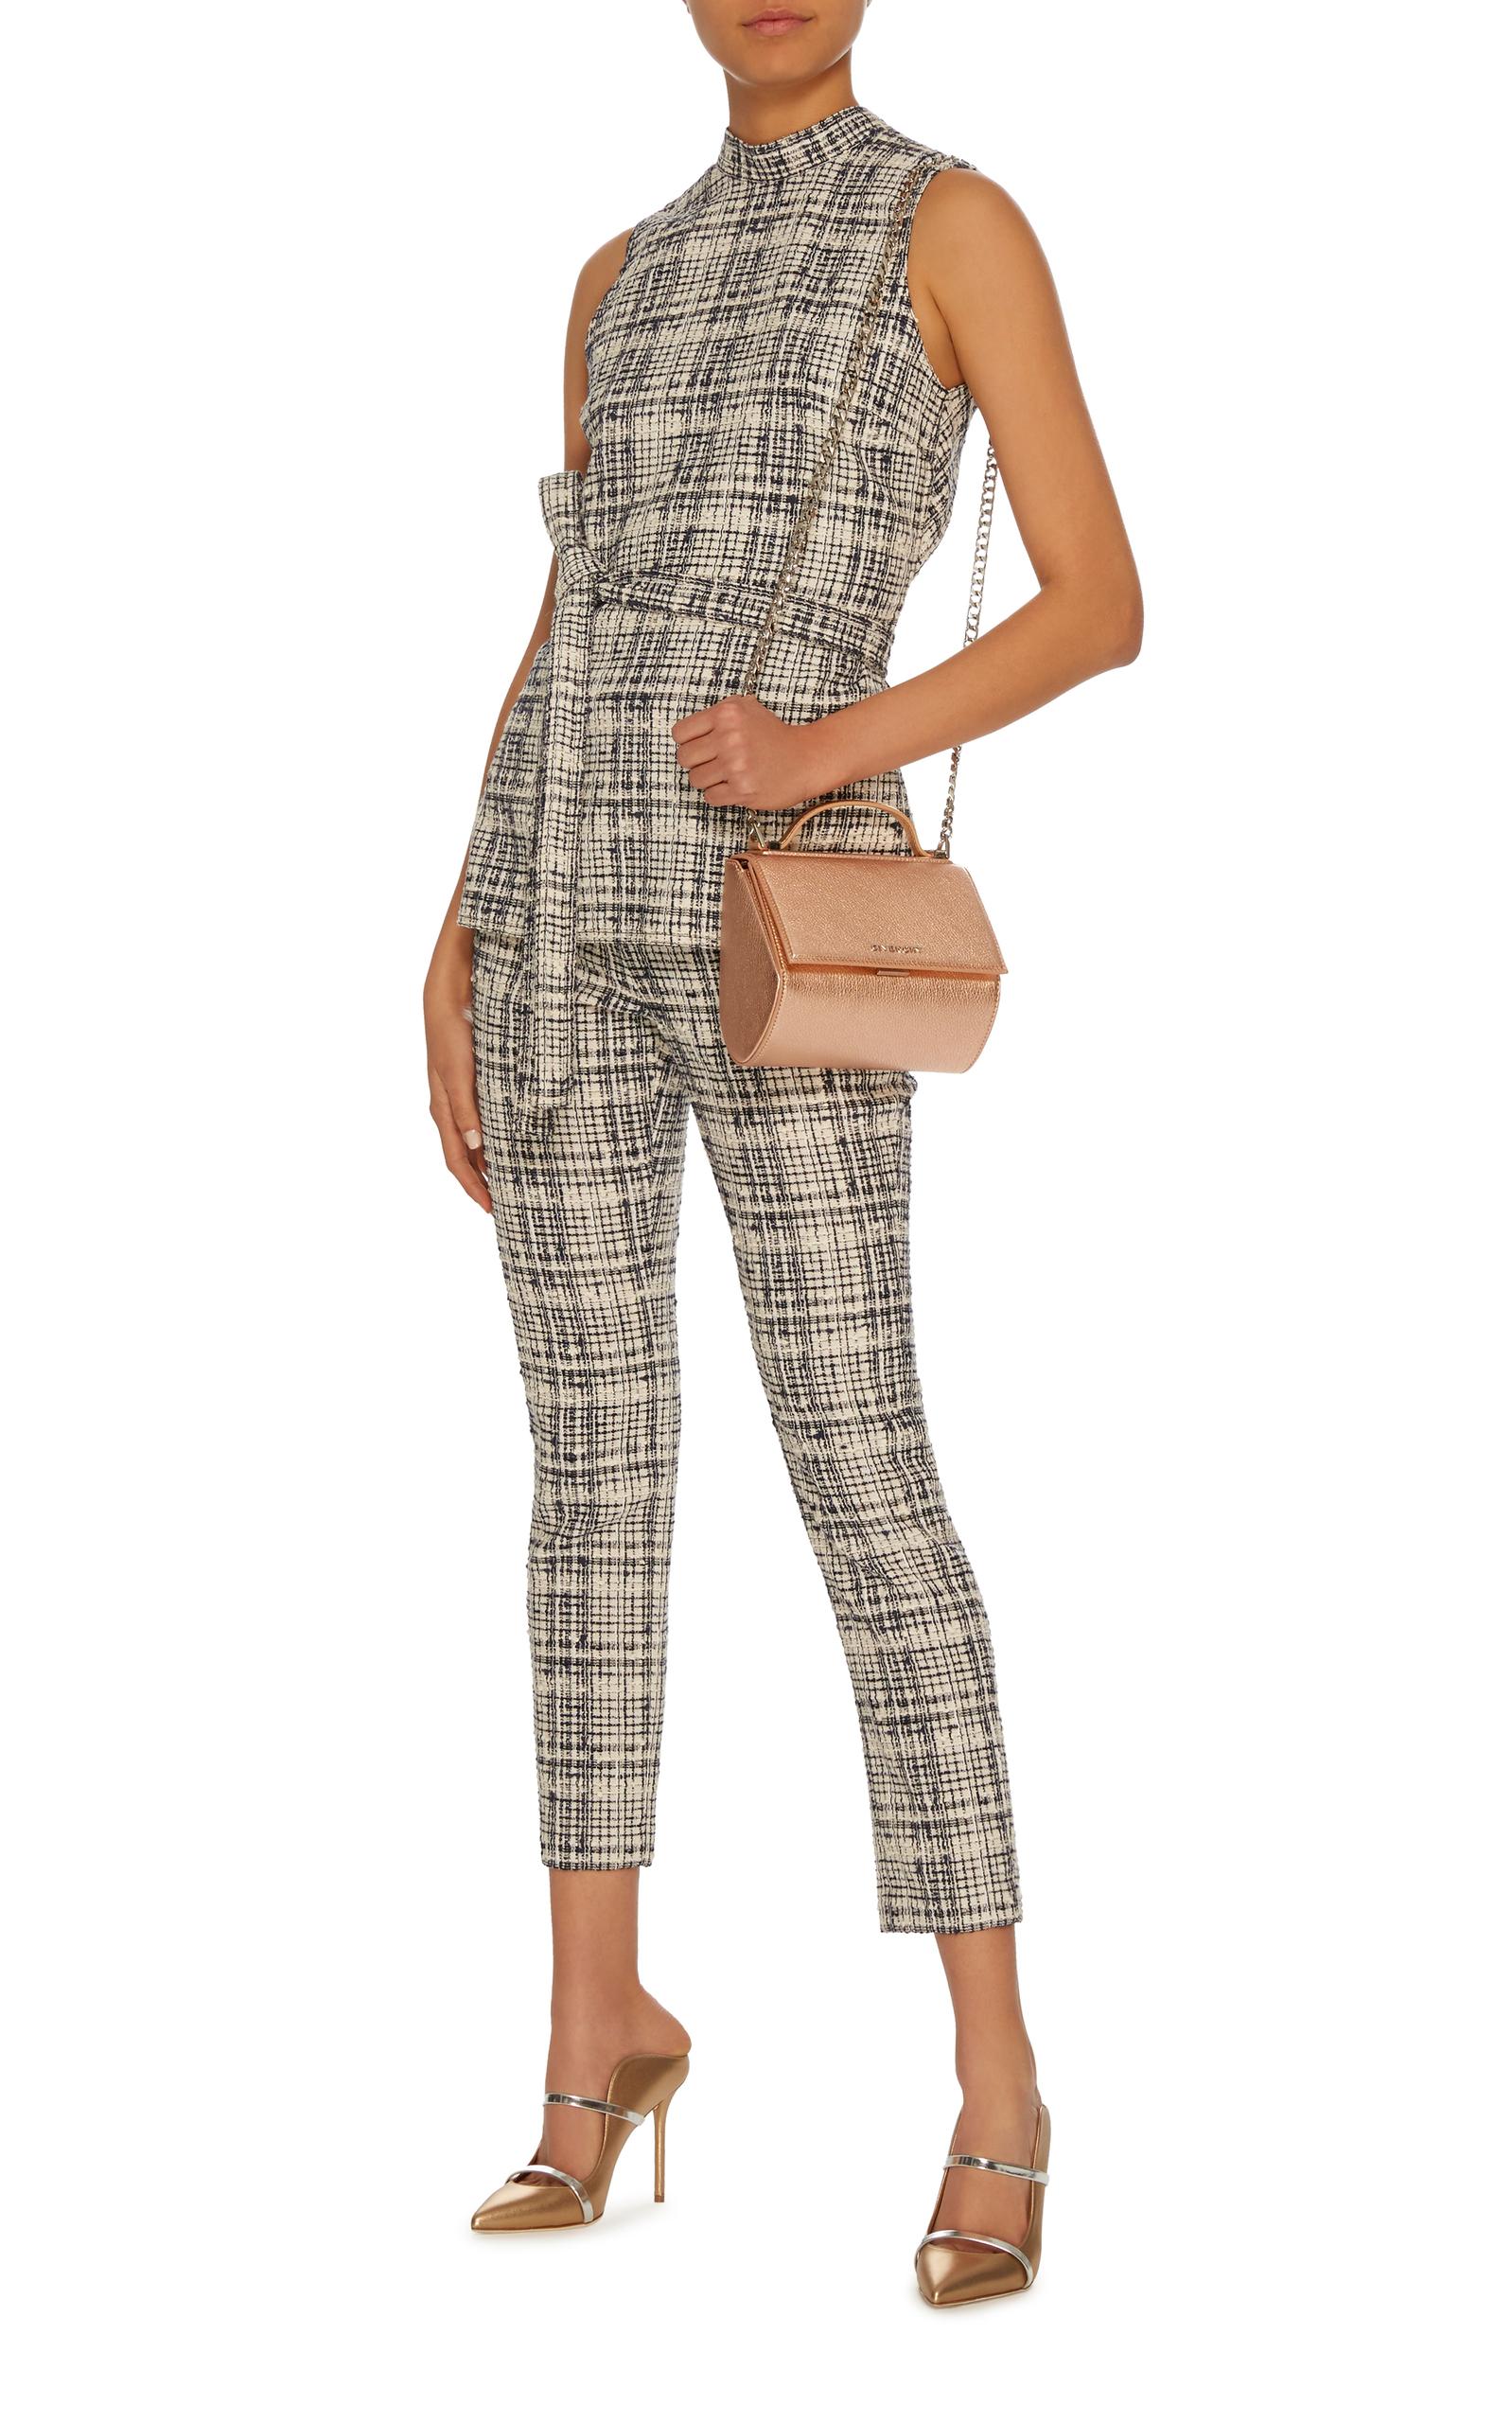 Mini Pandora Box Leather Shoulder Bag by Givenchy  c7e28bf0231e1